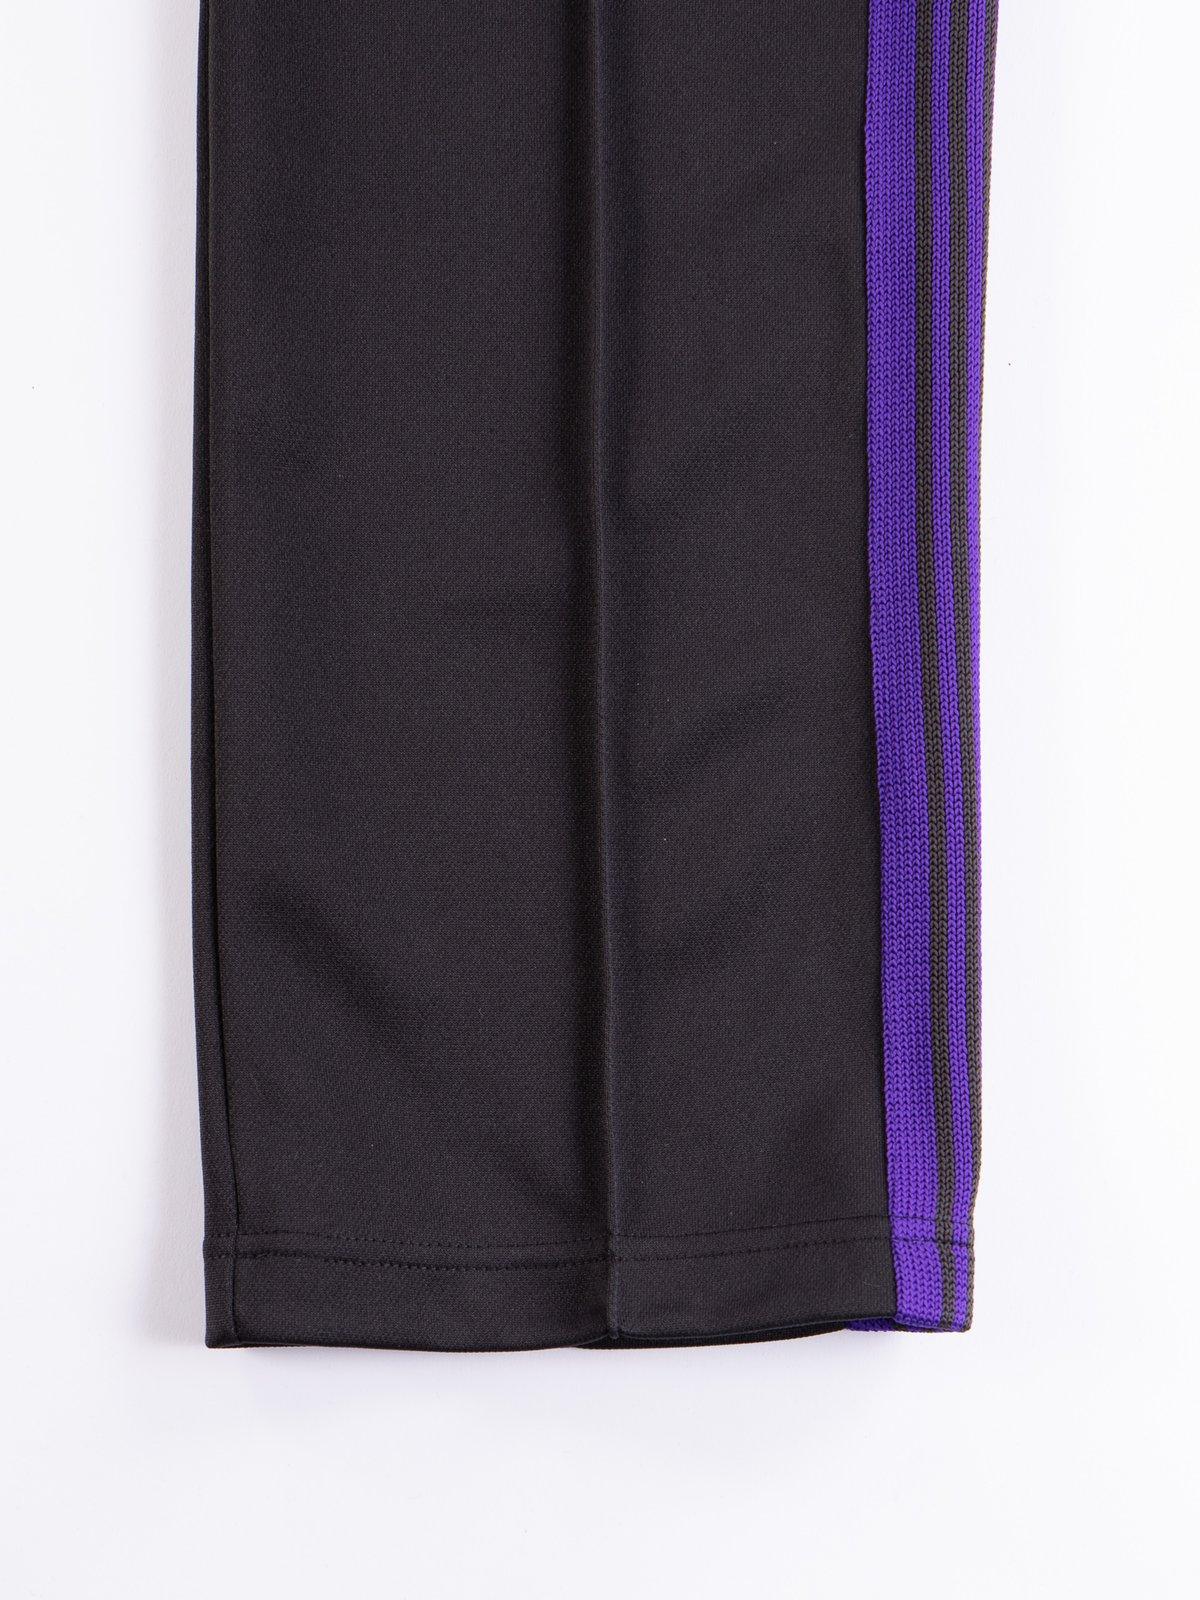 Charcoal Narrow Track Pant - Image 4